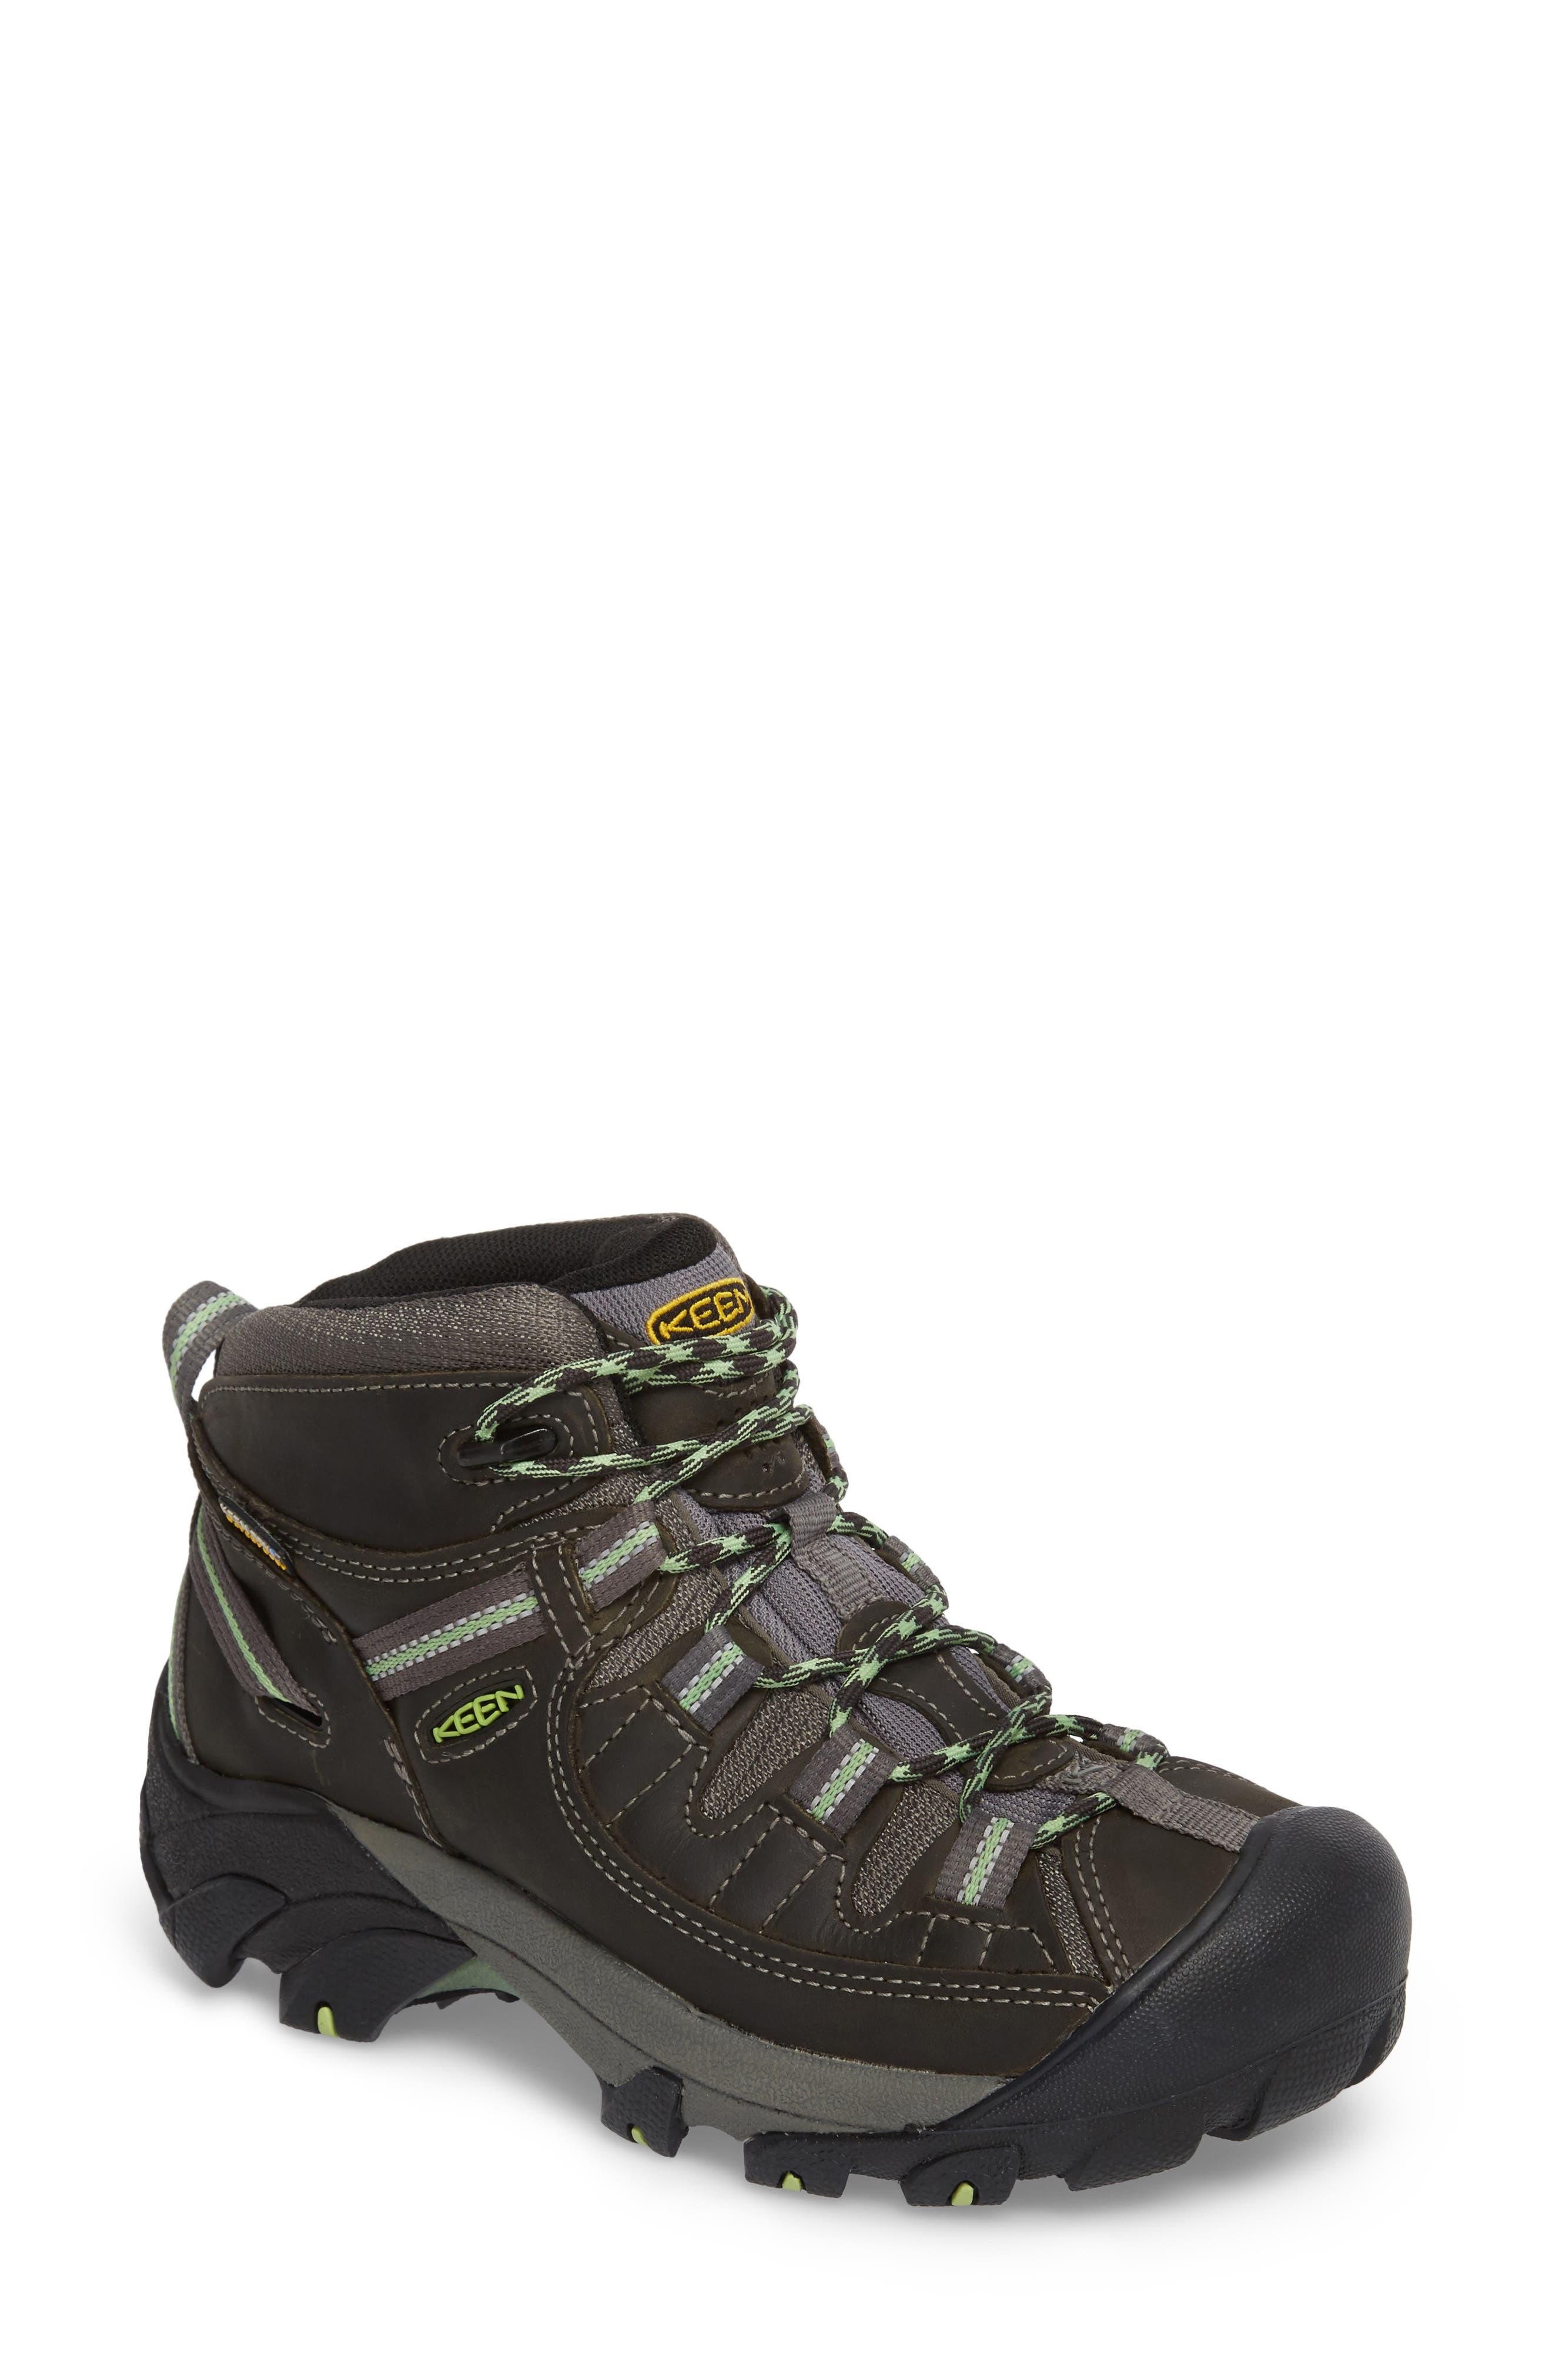 Targhee II Mid Waterproof Hiking Boot,                         Main,                         color, RAVEN/ OPALINE